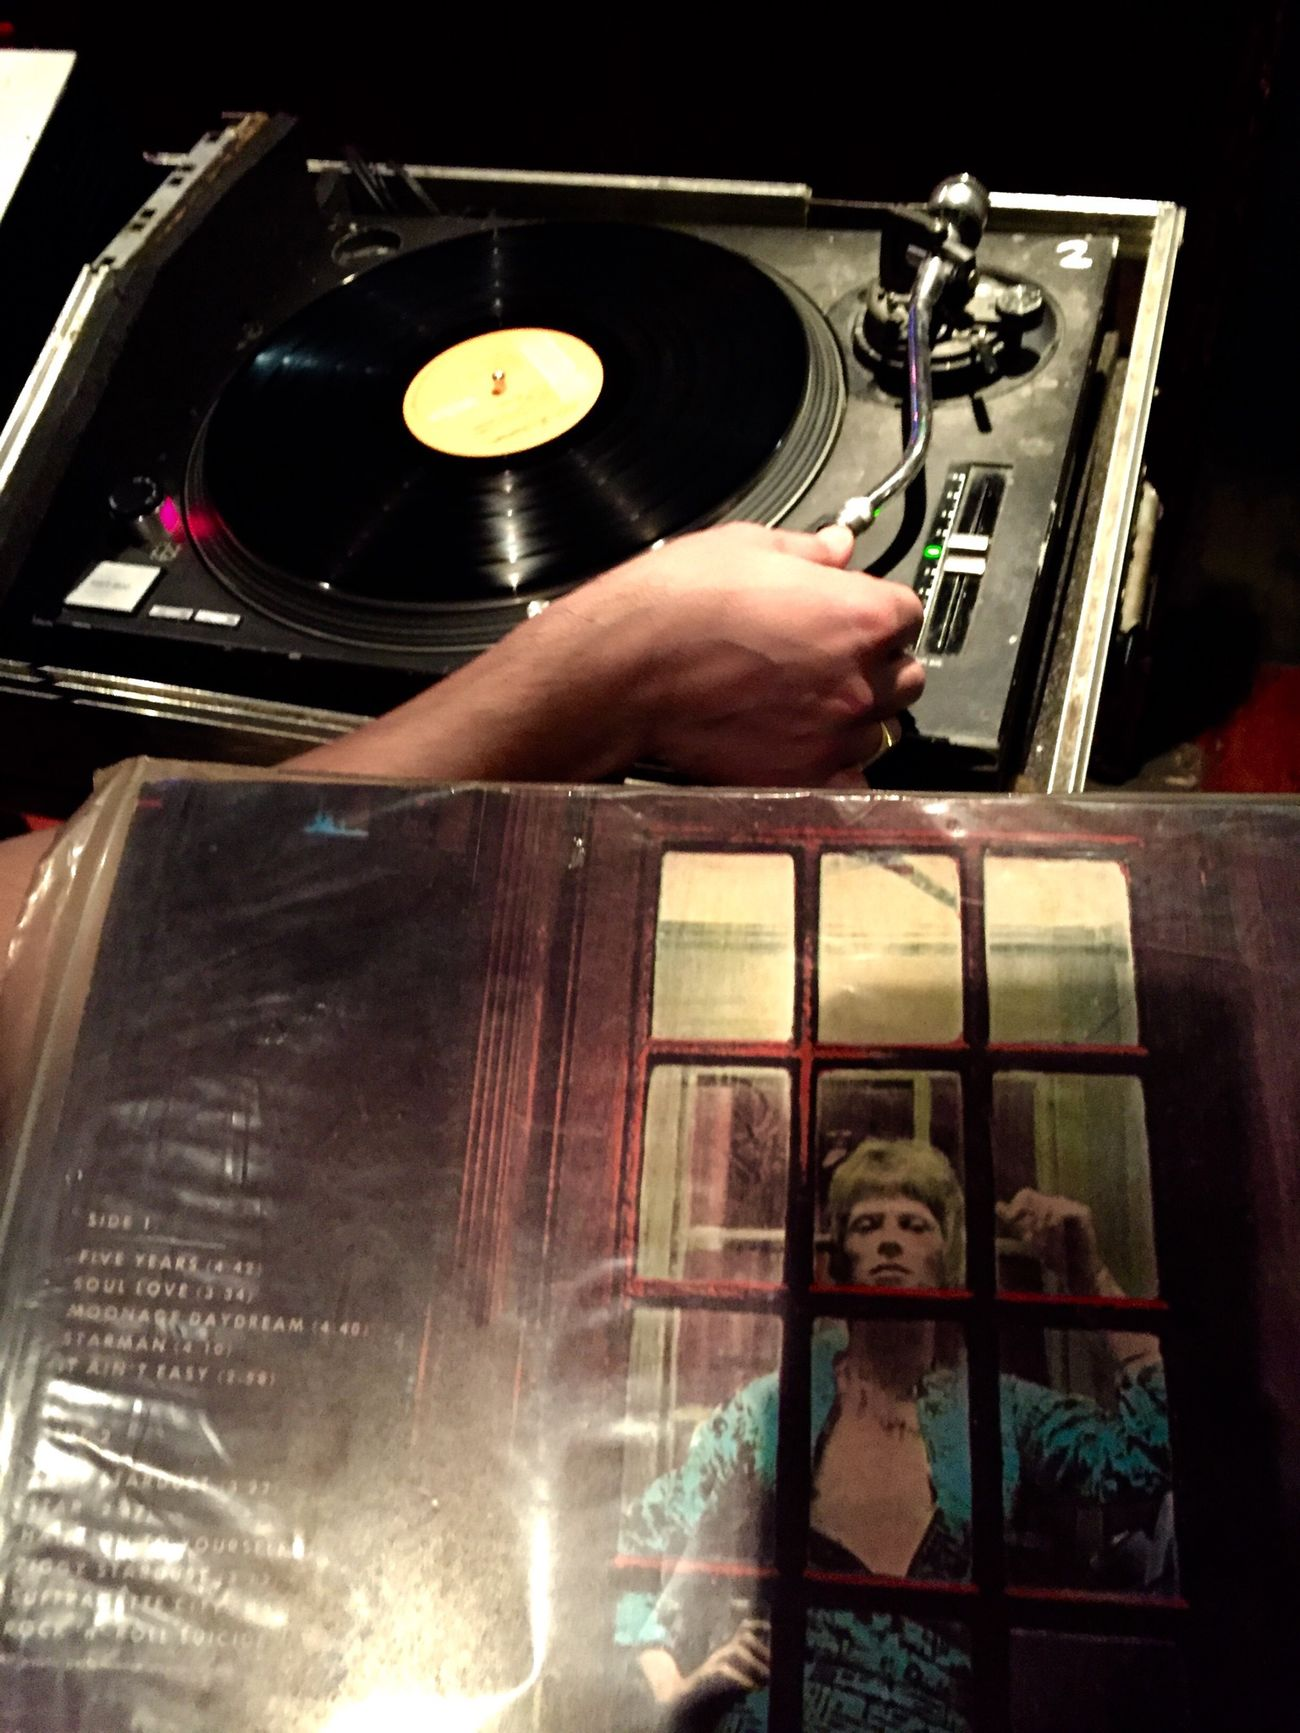 David Bowie Dedication Vinyl DJing Pub Record Turn Table Music Tunes